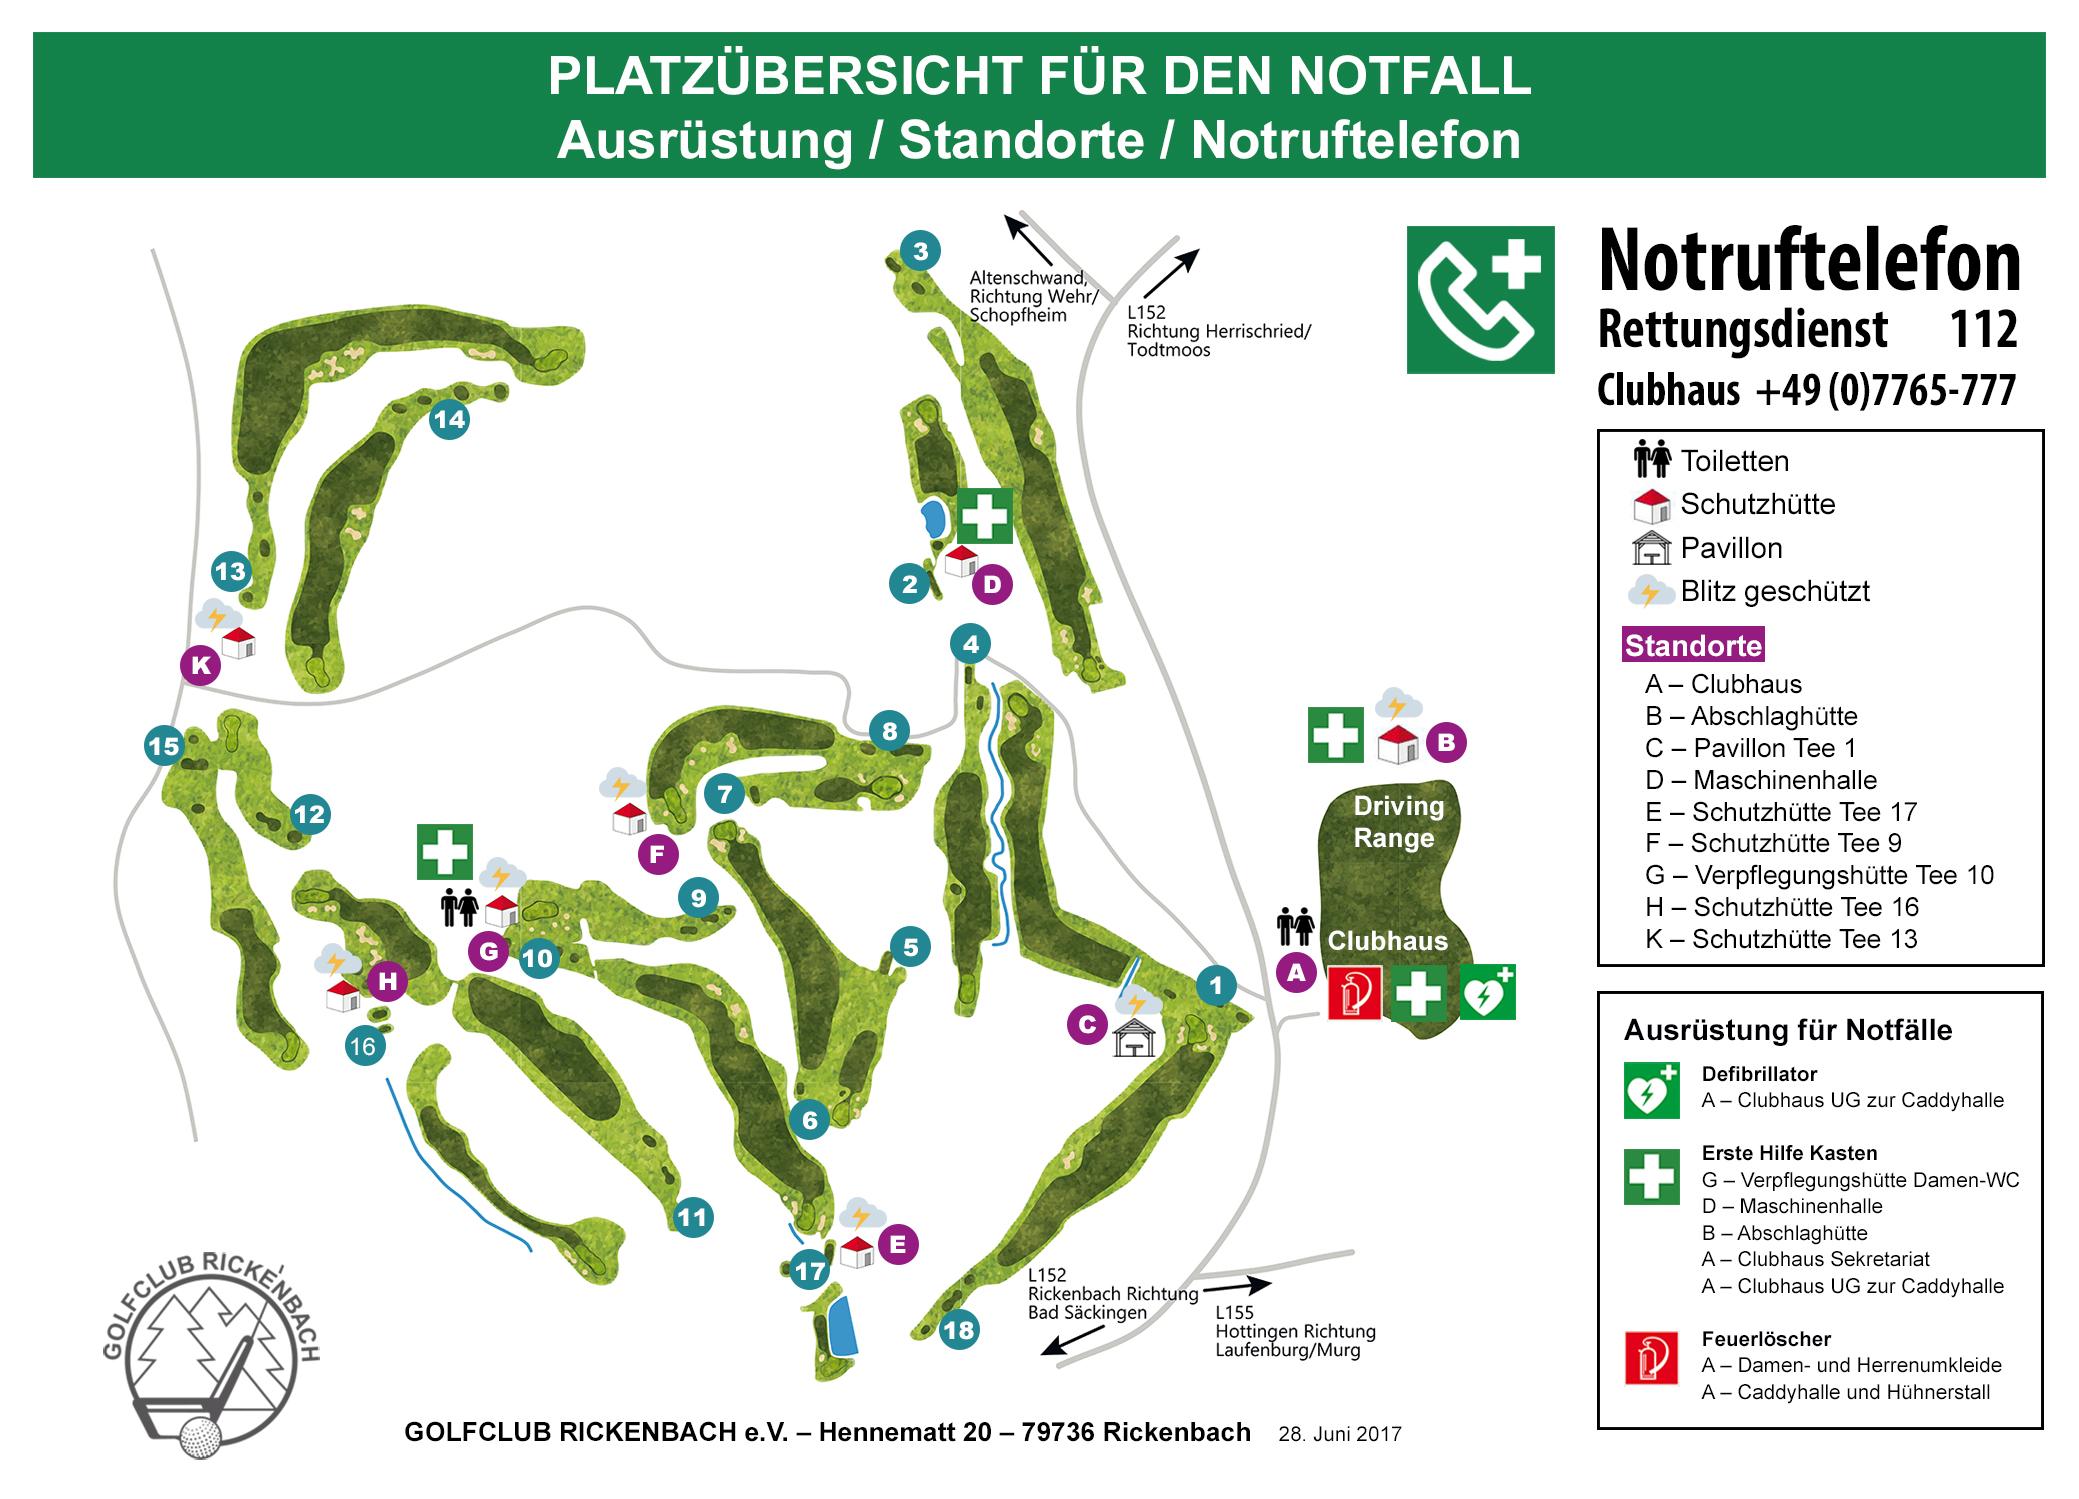 Platzübersicht - Notfall - Golfclub Rickenbach